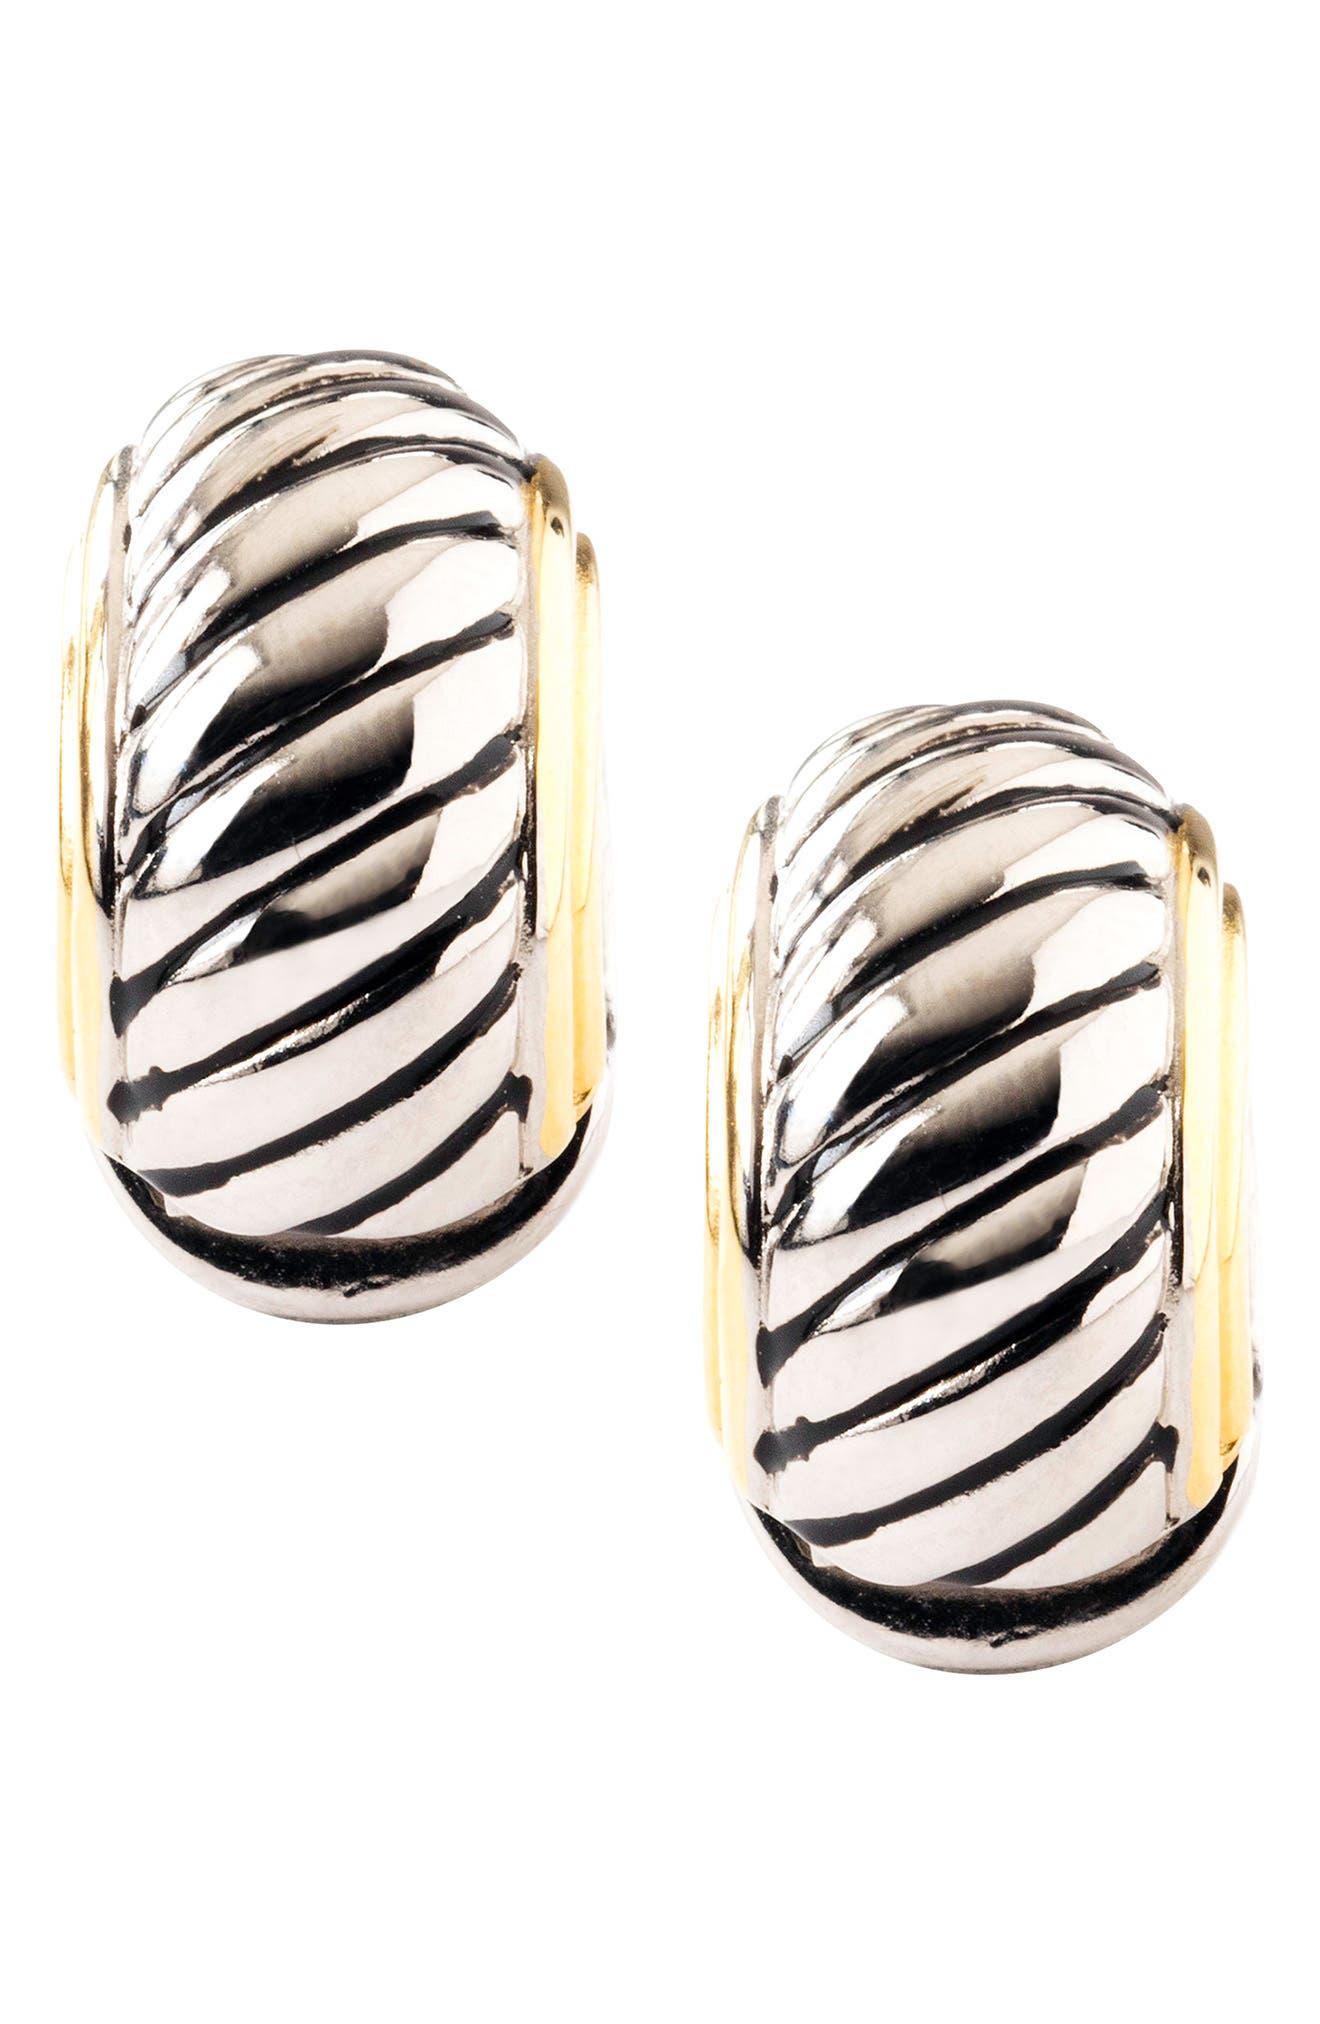 Diagonal Ridge Metallic Reversible Earrings,                             Main thumbnail 1, color,                             SILVER/ GOLD